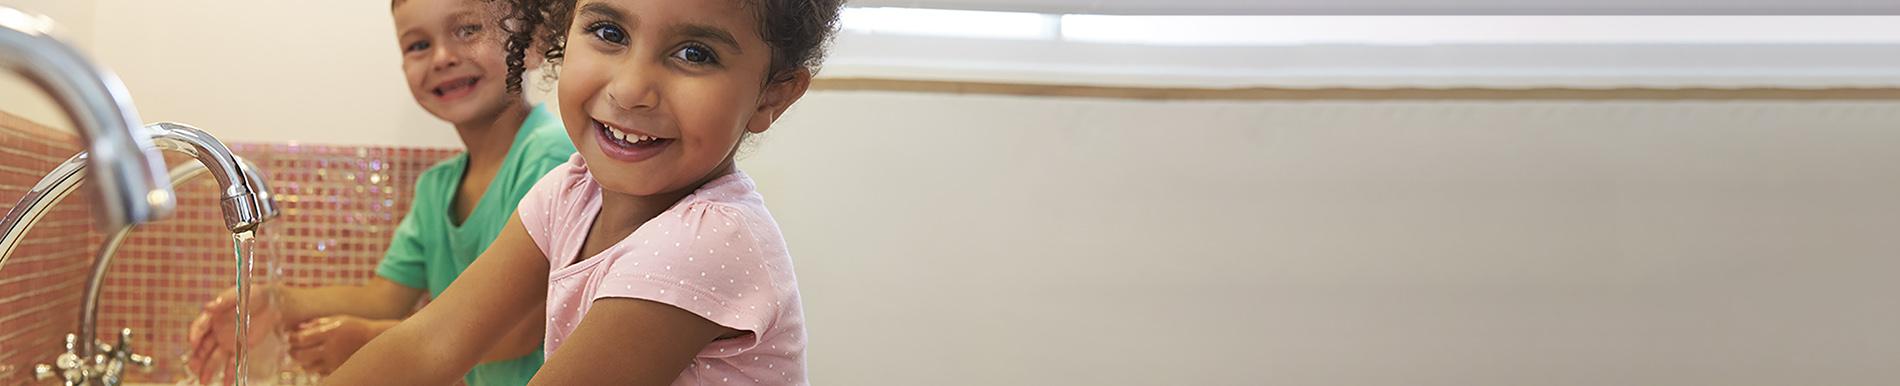 https://www.healthychildren.org/SiteCollectionImage-Homepage-Banners/Coronavirus_Banner.jpg